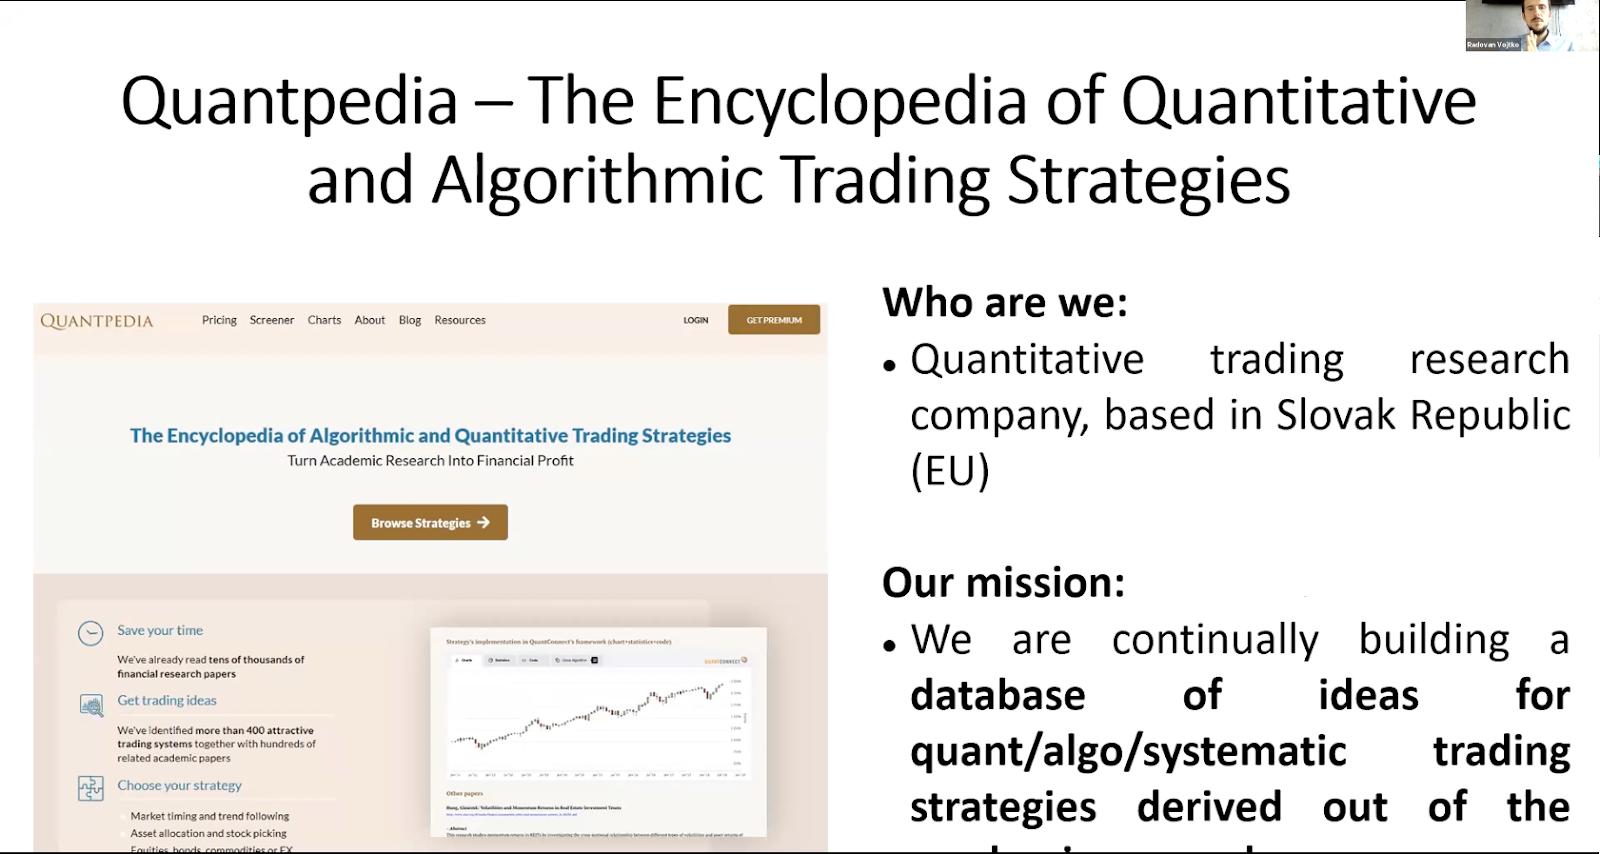 Quantpedia, Quantitative Trading Research Company